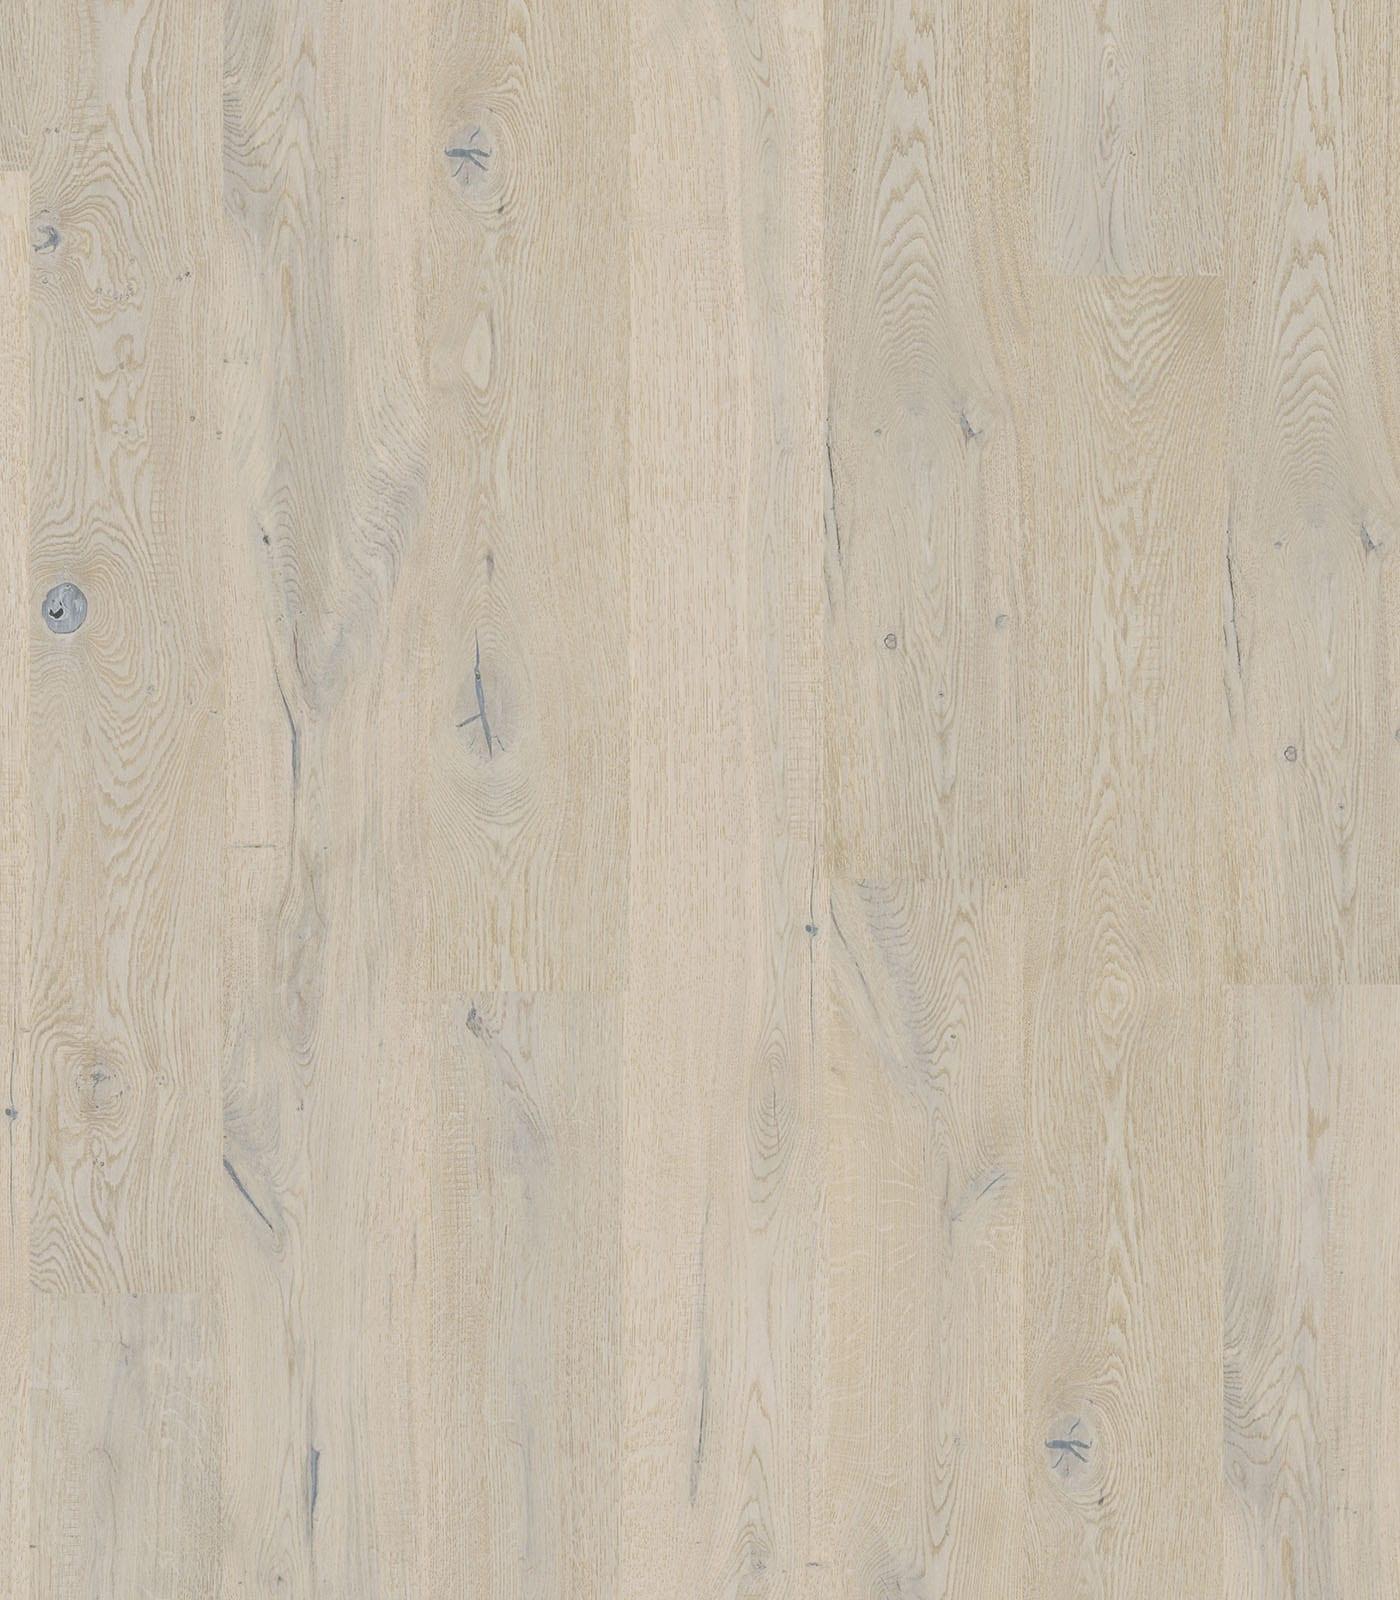 Ellsworth-Antique Collection-European Oak Floors-flat